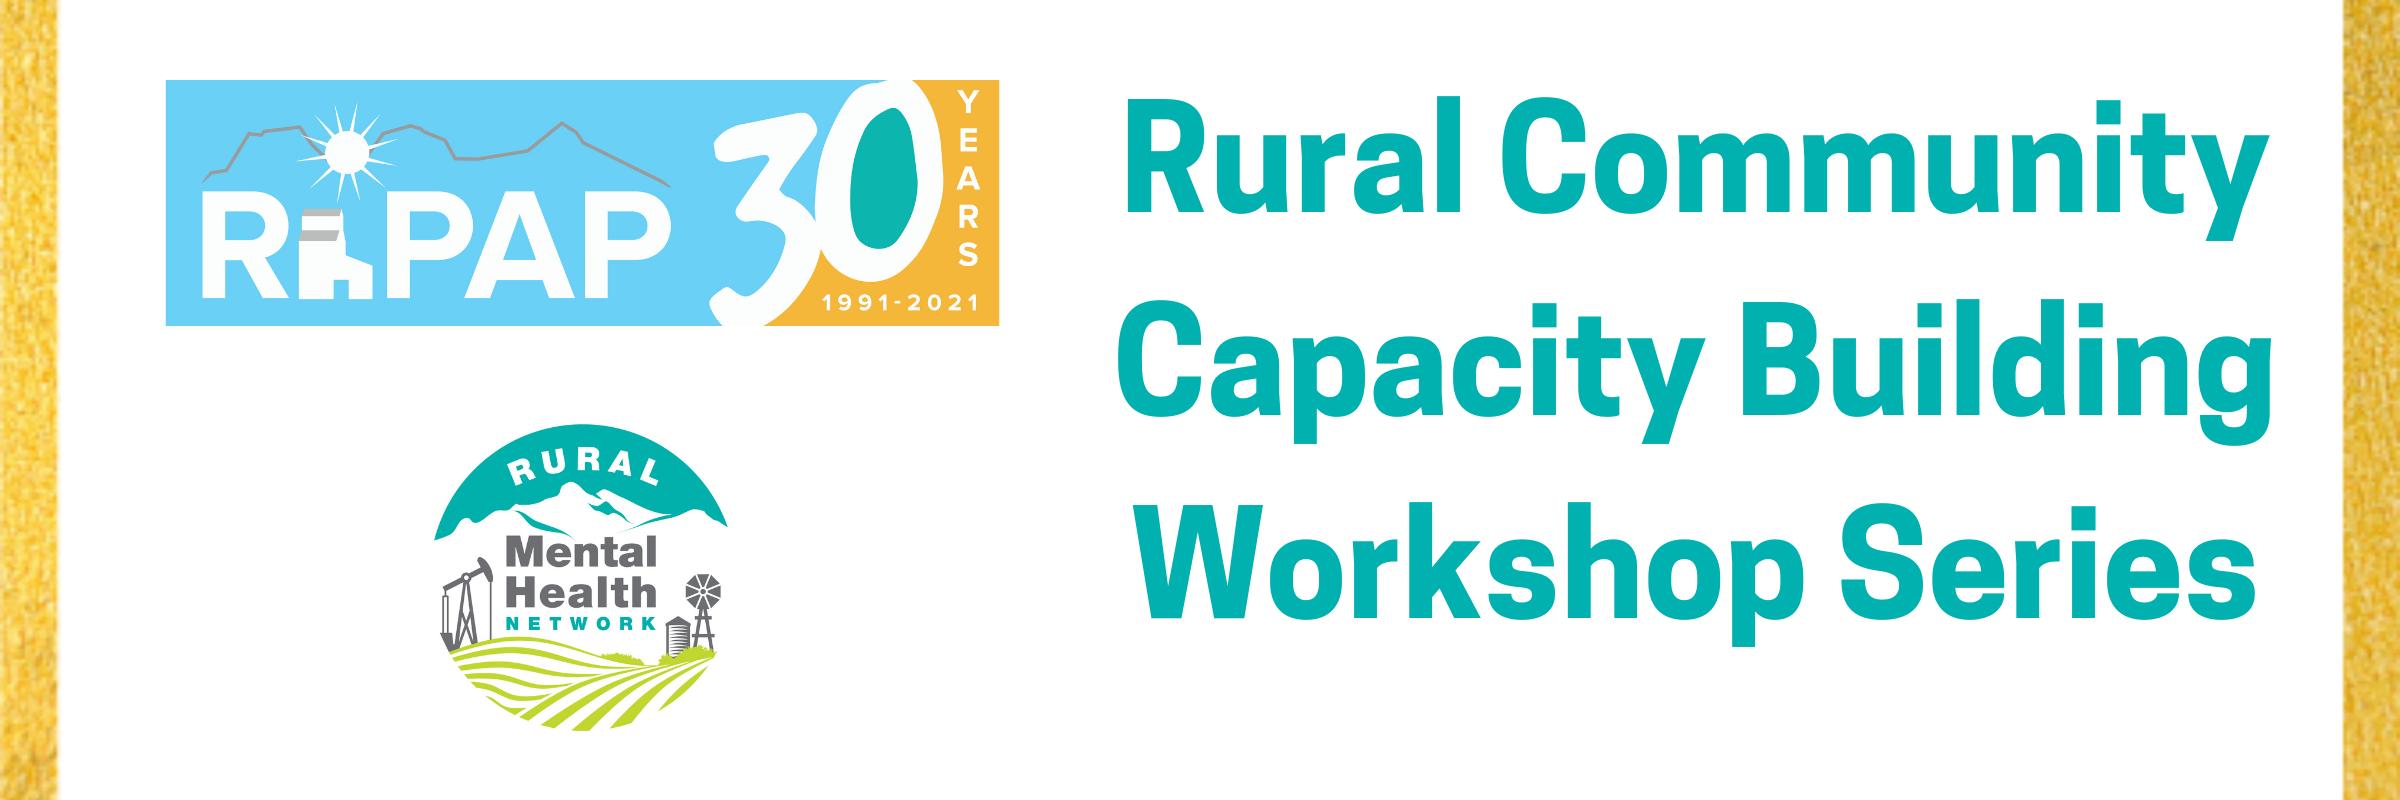 Rural Community Capacity Building Series Banner v2